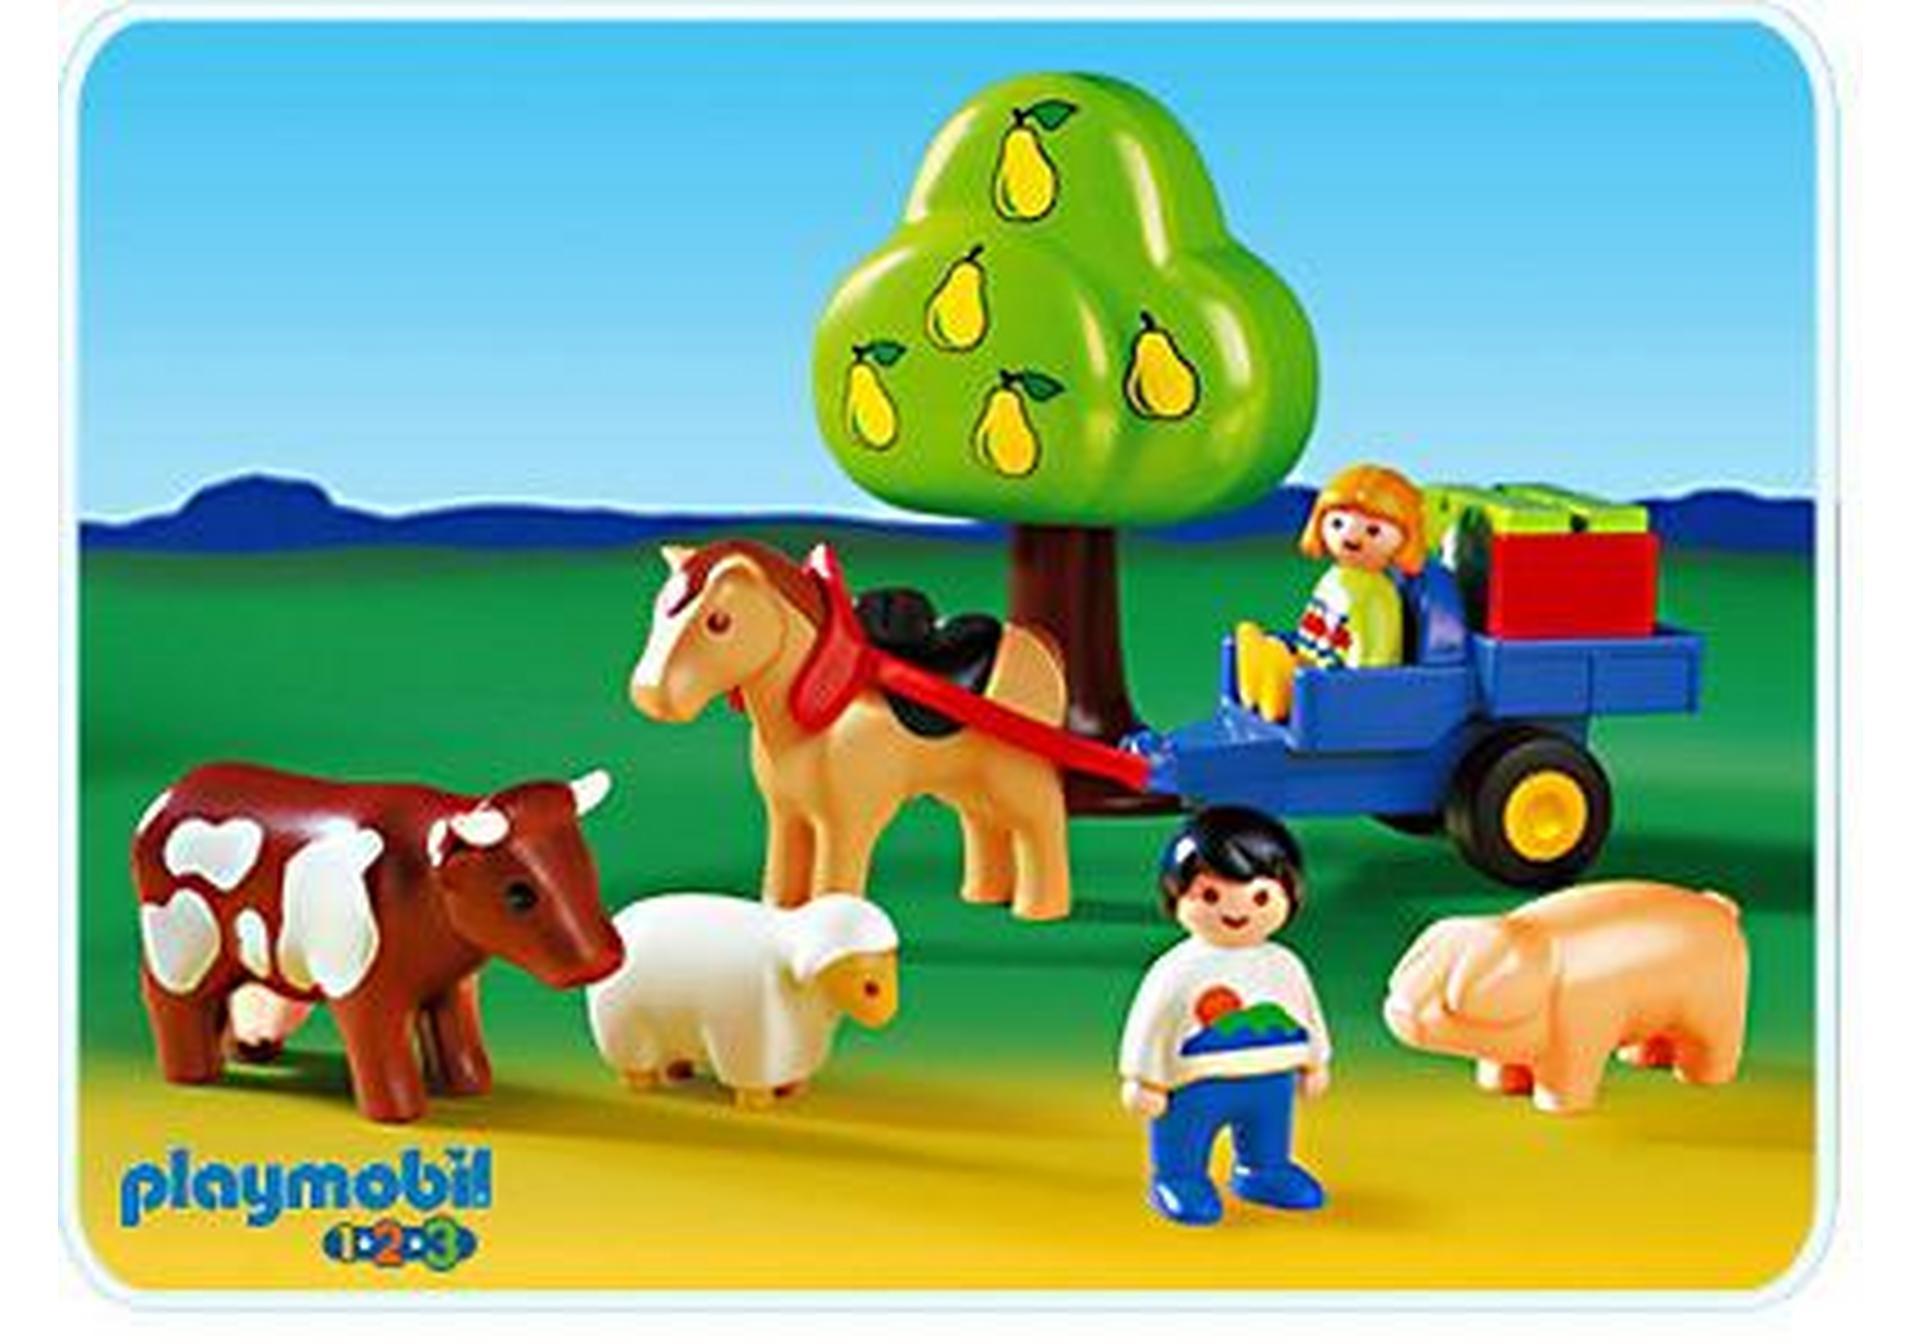 enfants charrette animaux 1 2 3 6620 a playmobil france. Black Bedroom Furniture Sets. Home Design Ideas